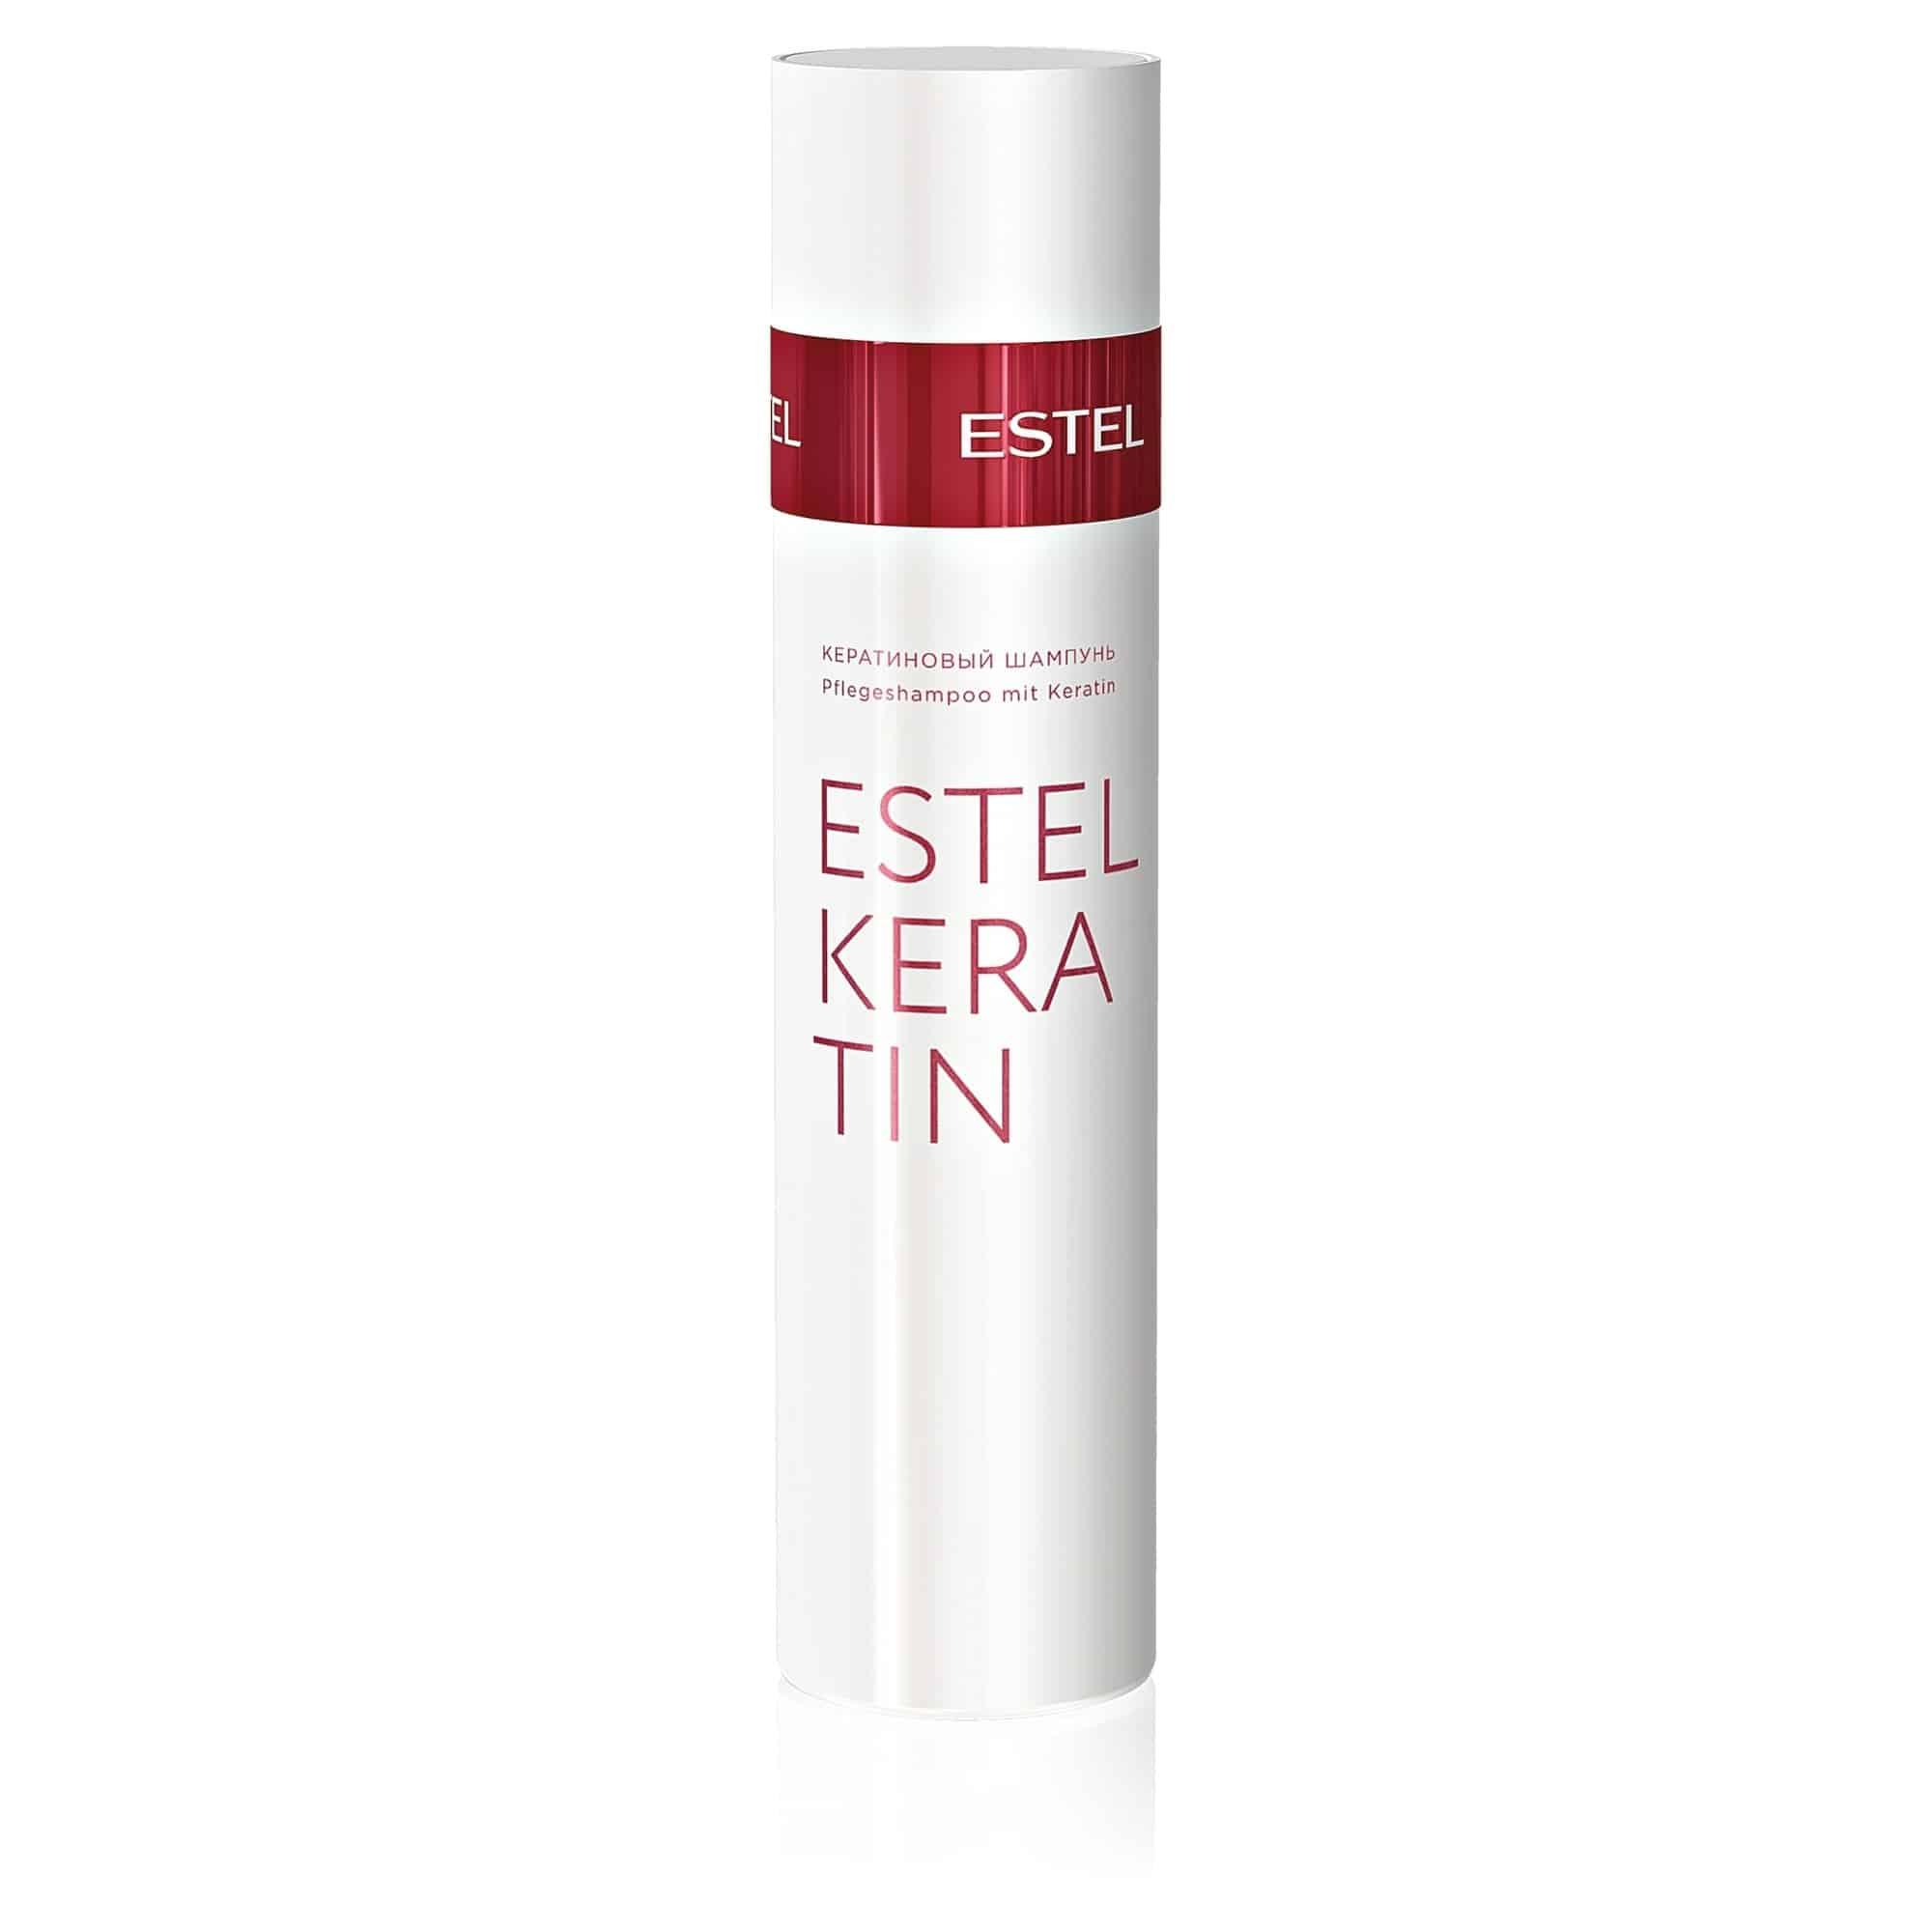 KERATIN Pflegeshampoo mit Keratin